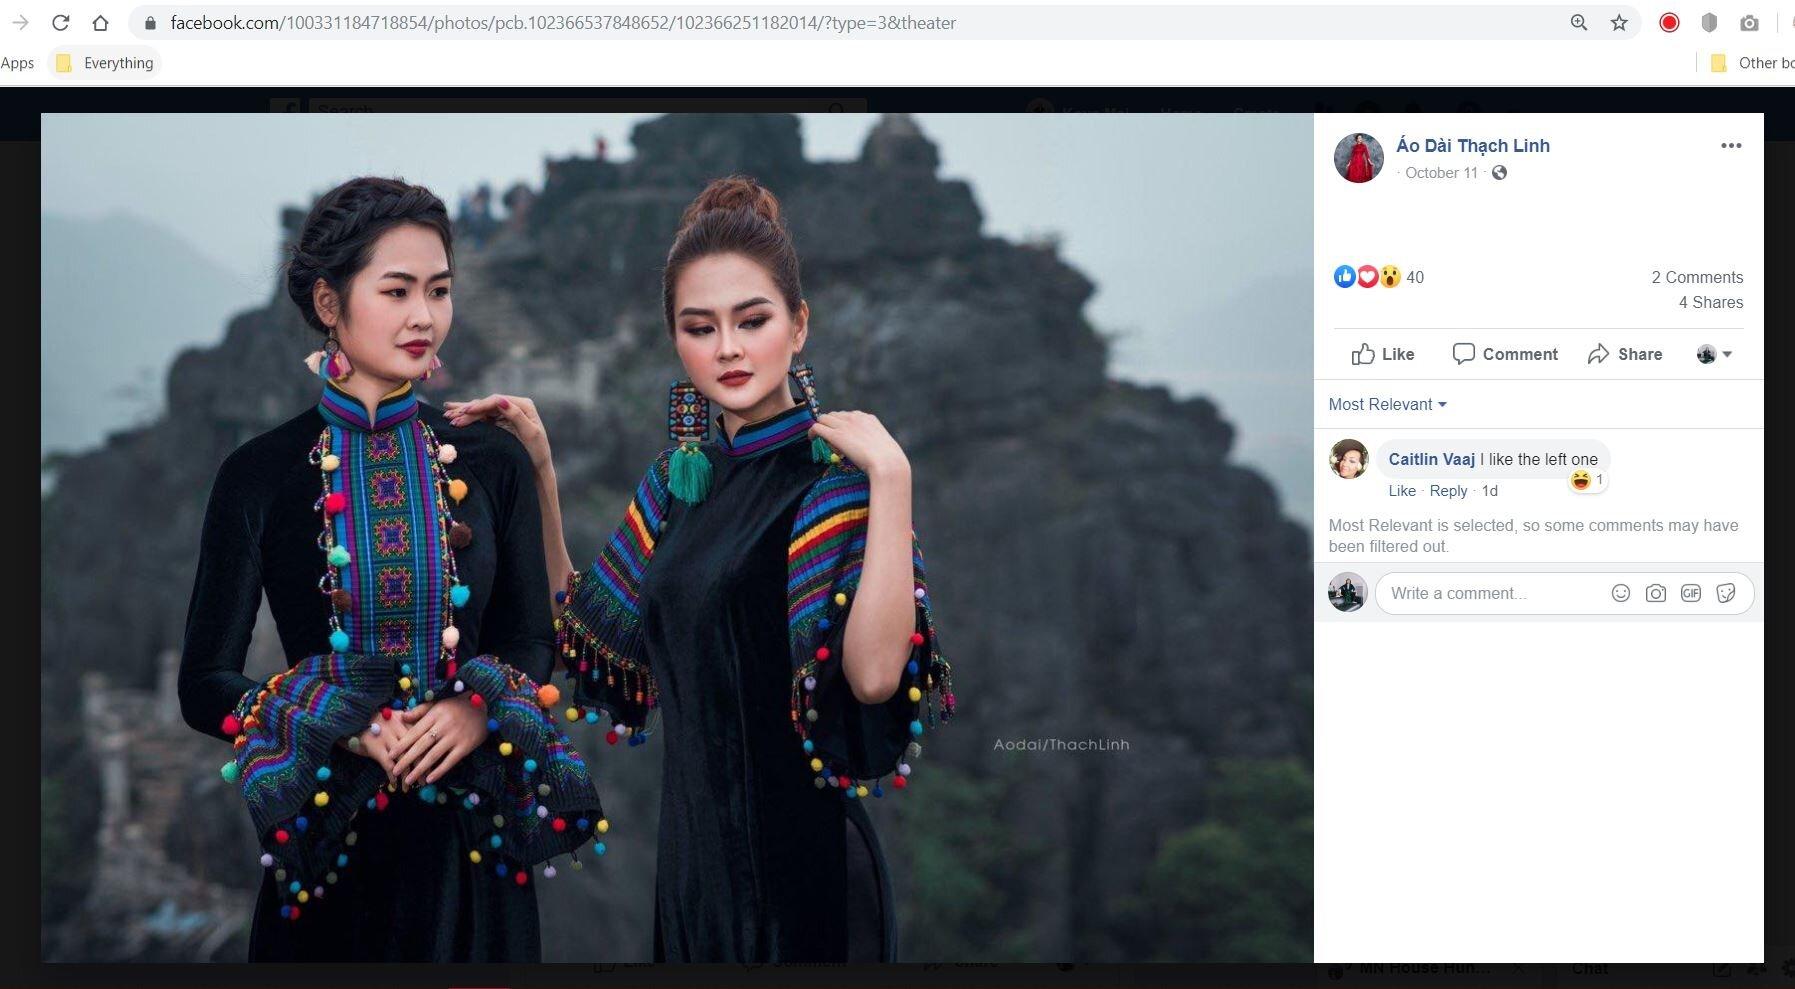 Facebookpage_Vietnamesedesigner_Oct_15_19_2.JPG